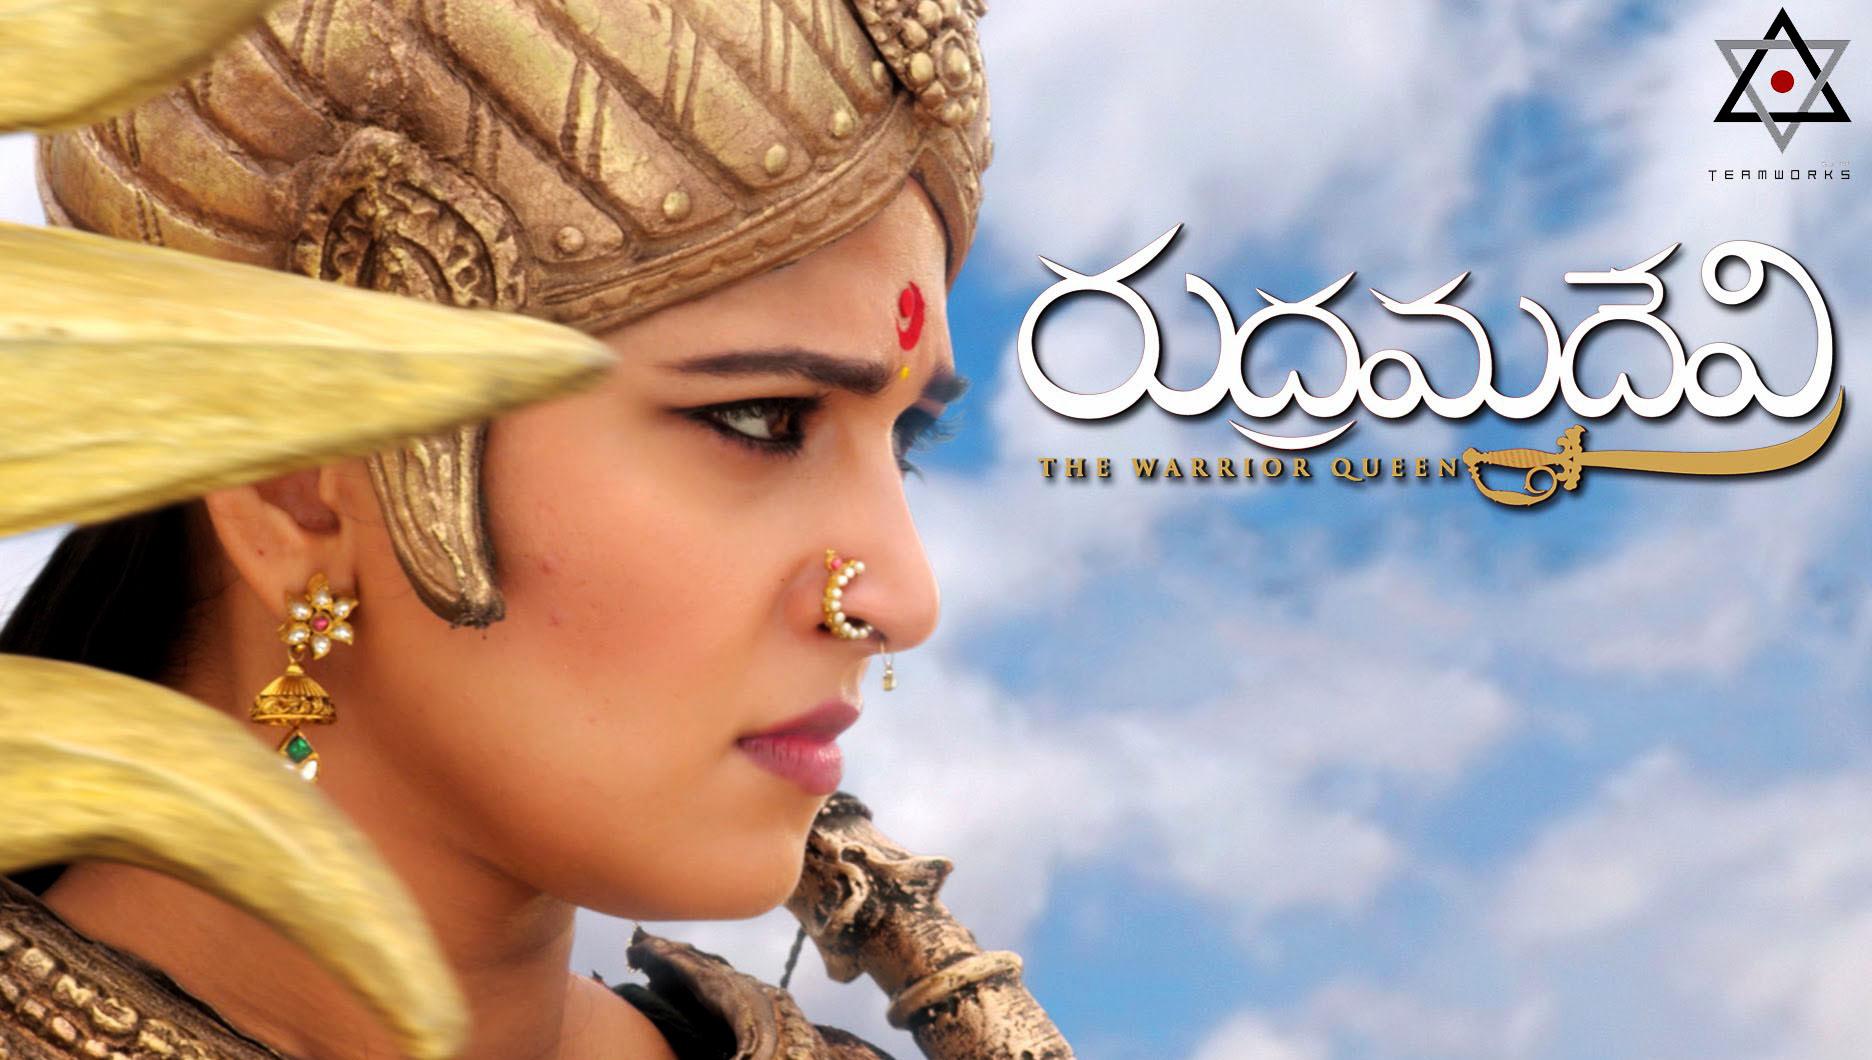 rudhramadevi release date postponed